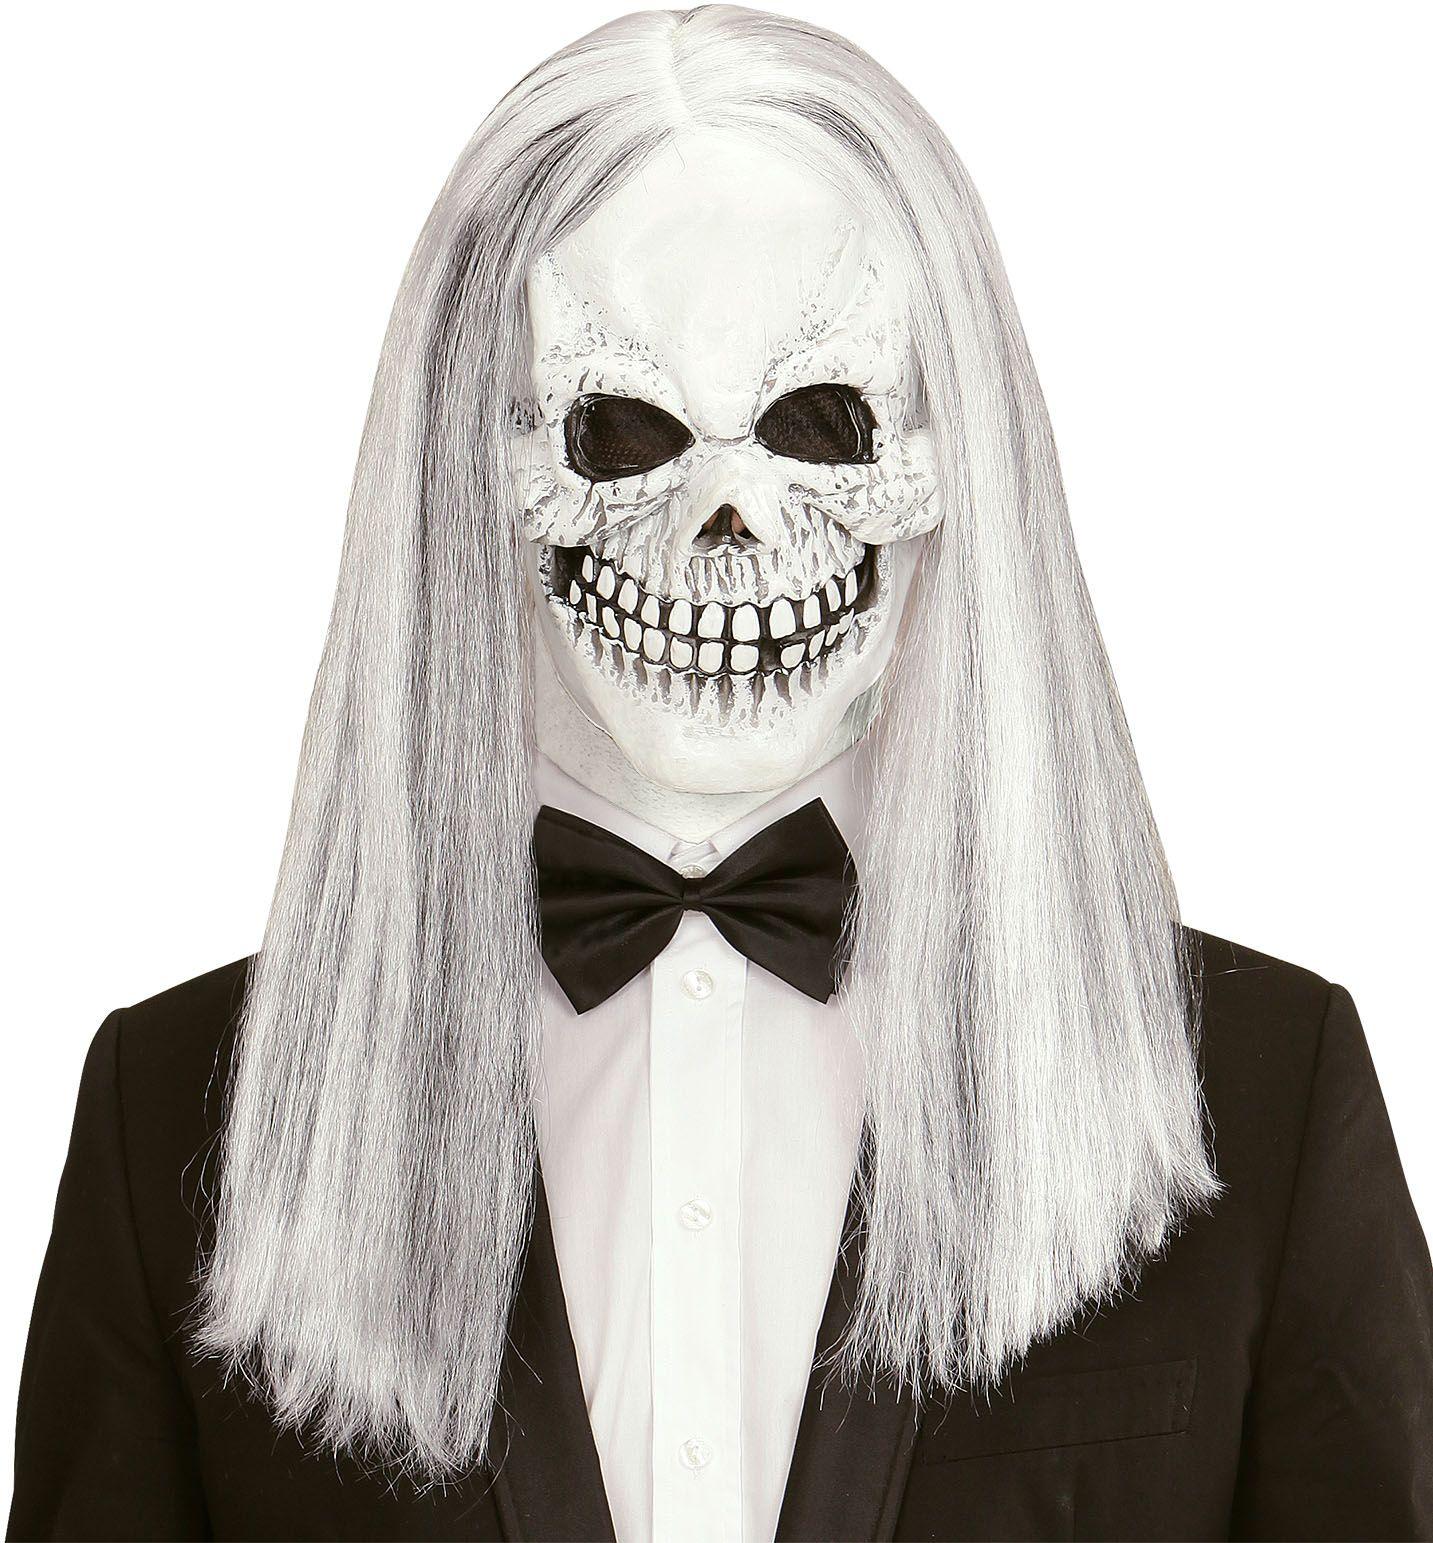 Wit schedel masker met pruik